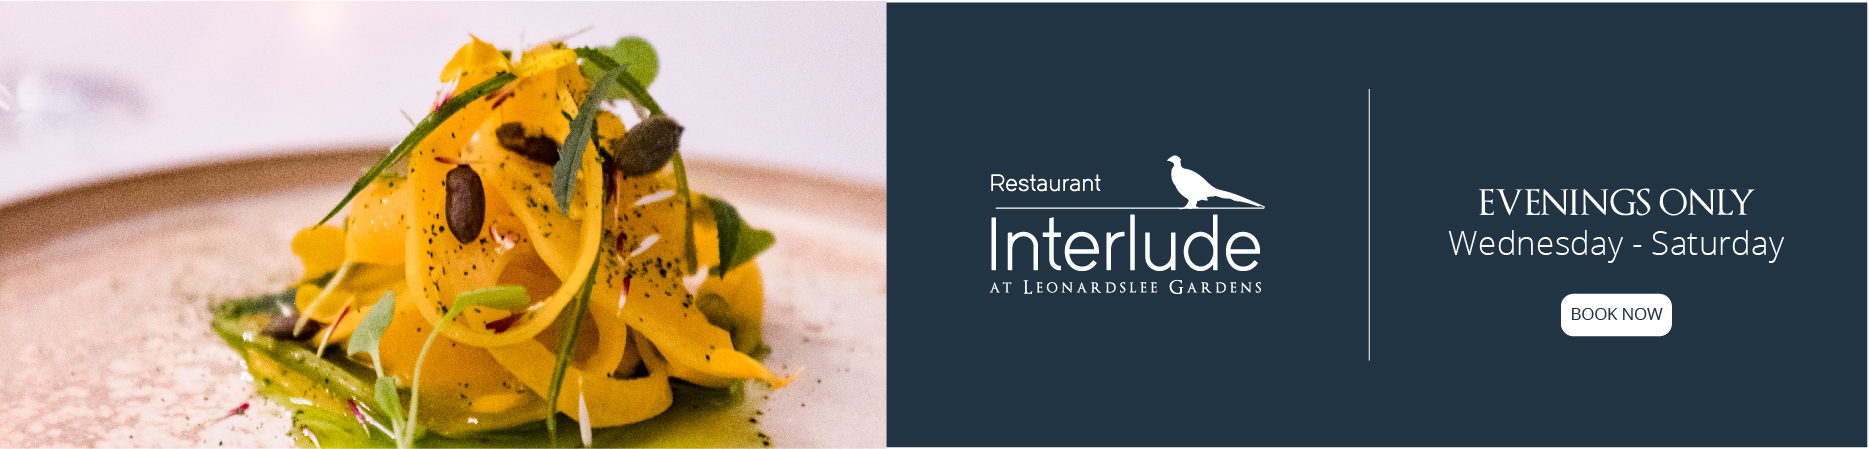 Restaurant Interlude book now web.jpg